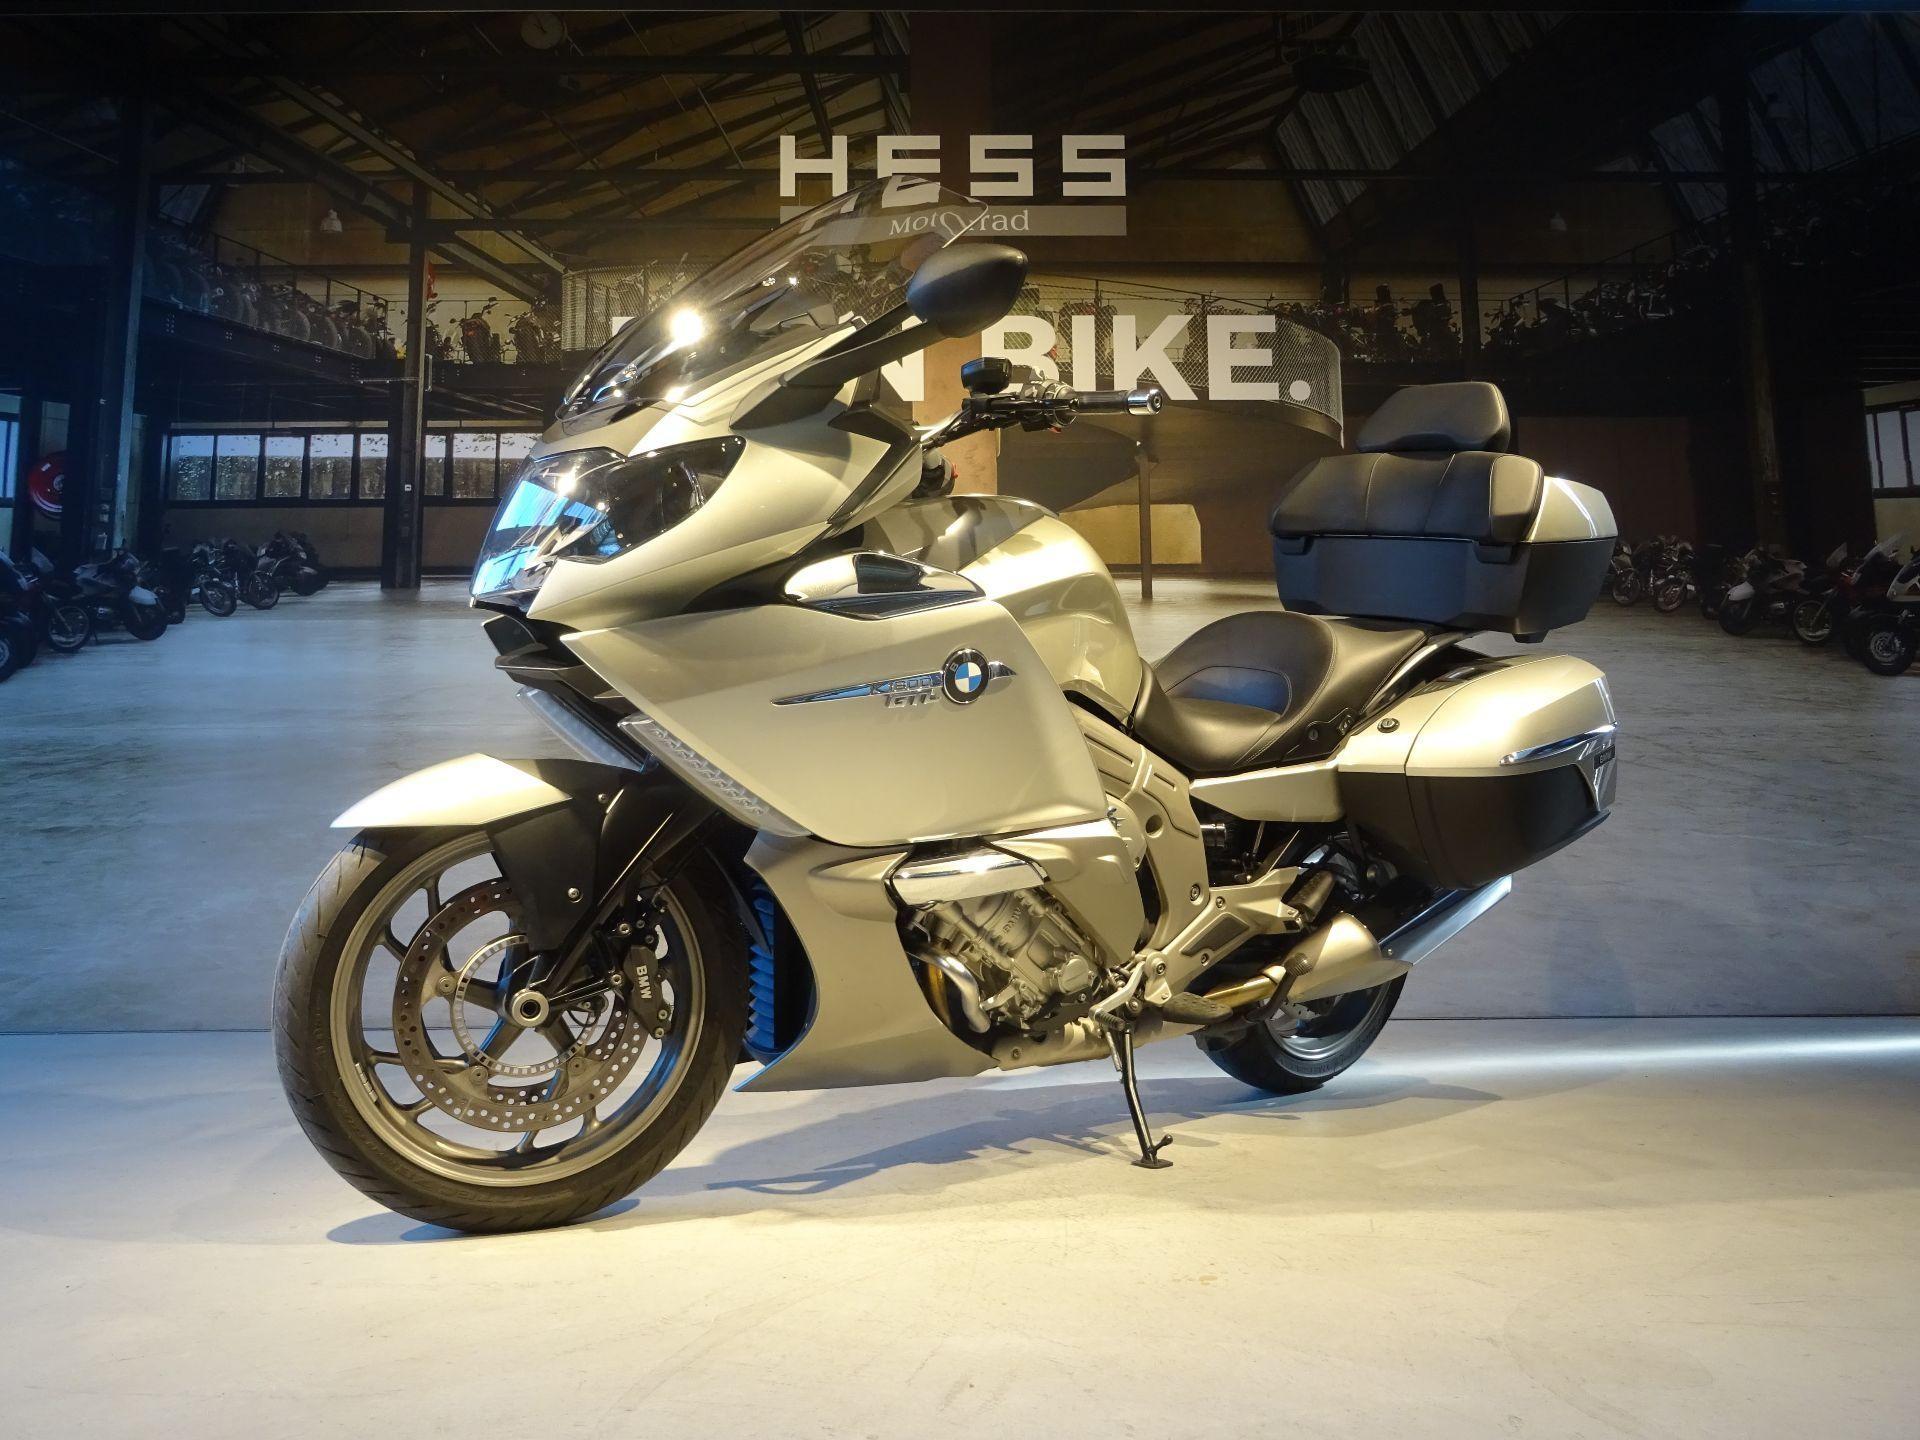 motorrad occasion kaufen bmw k 1600 gtl abs hess motorrad stettlen. Black Bedroom Furniture Sets. Home Design Ideas